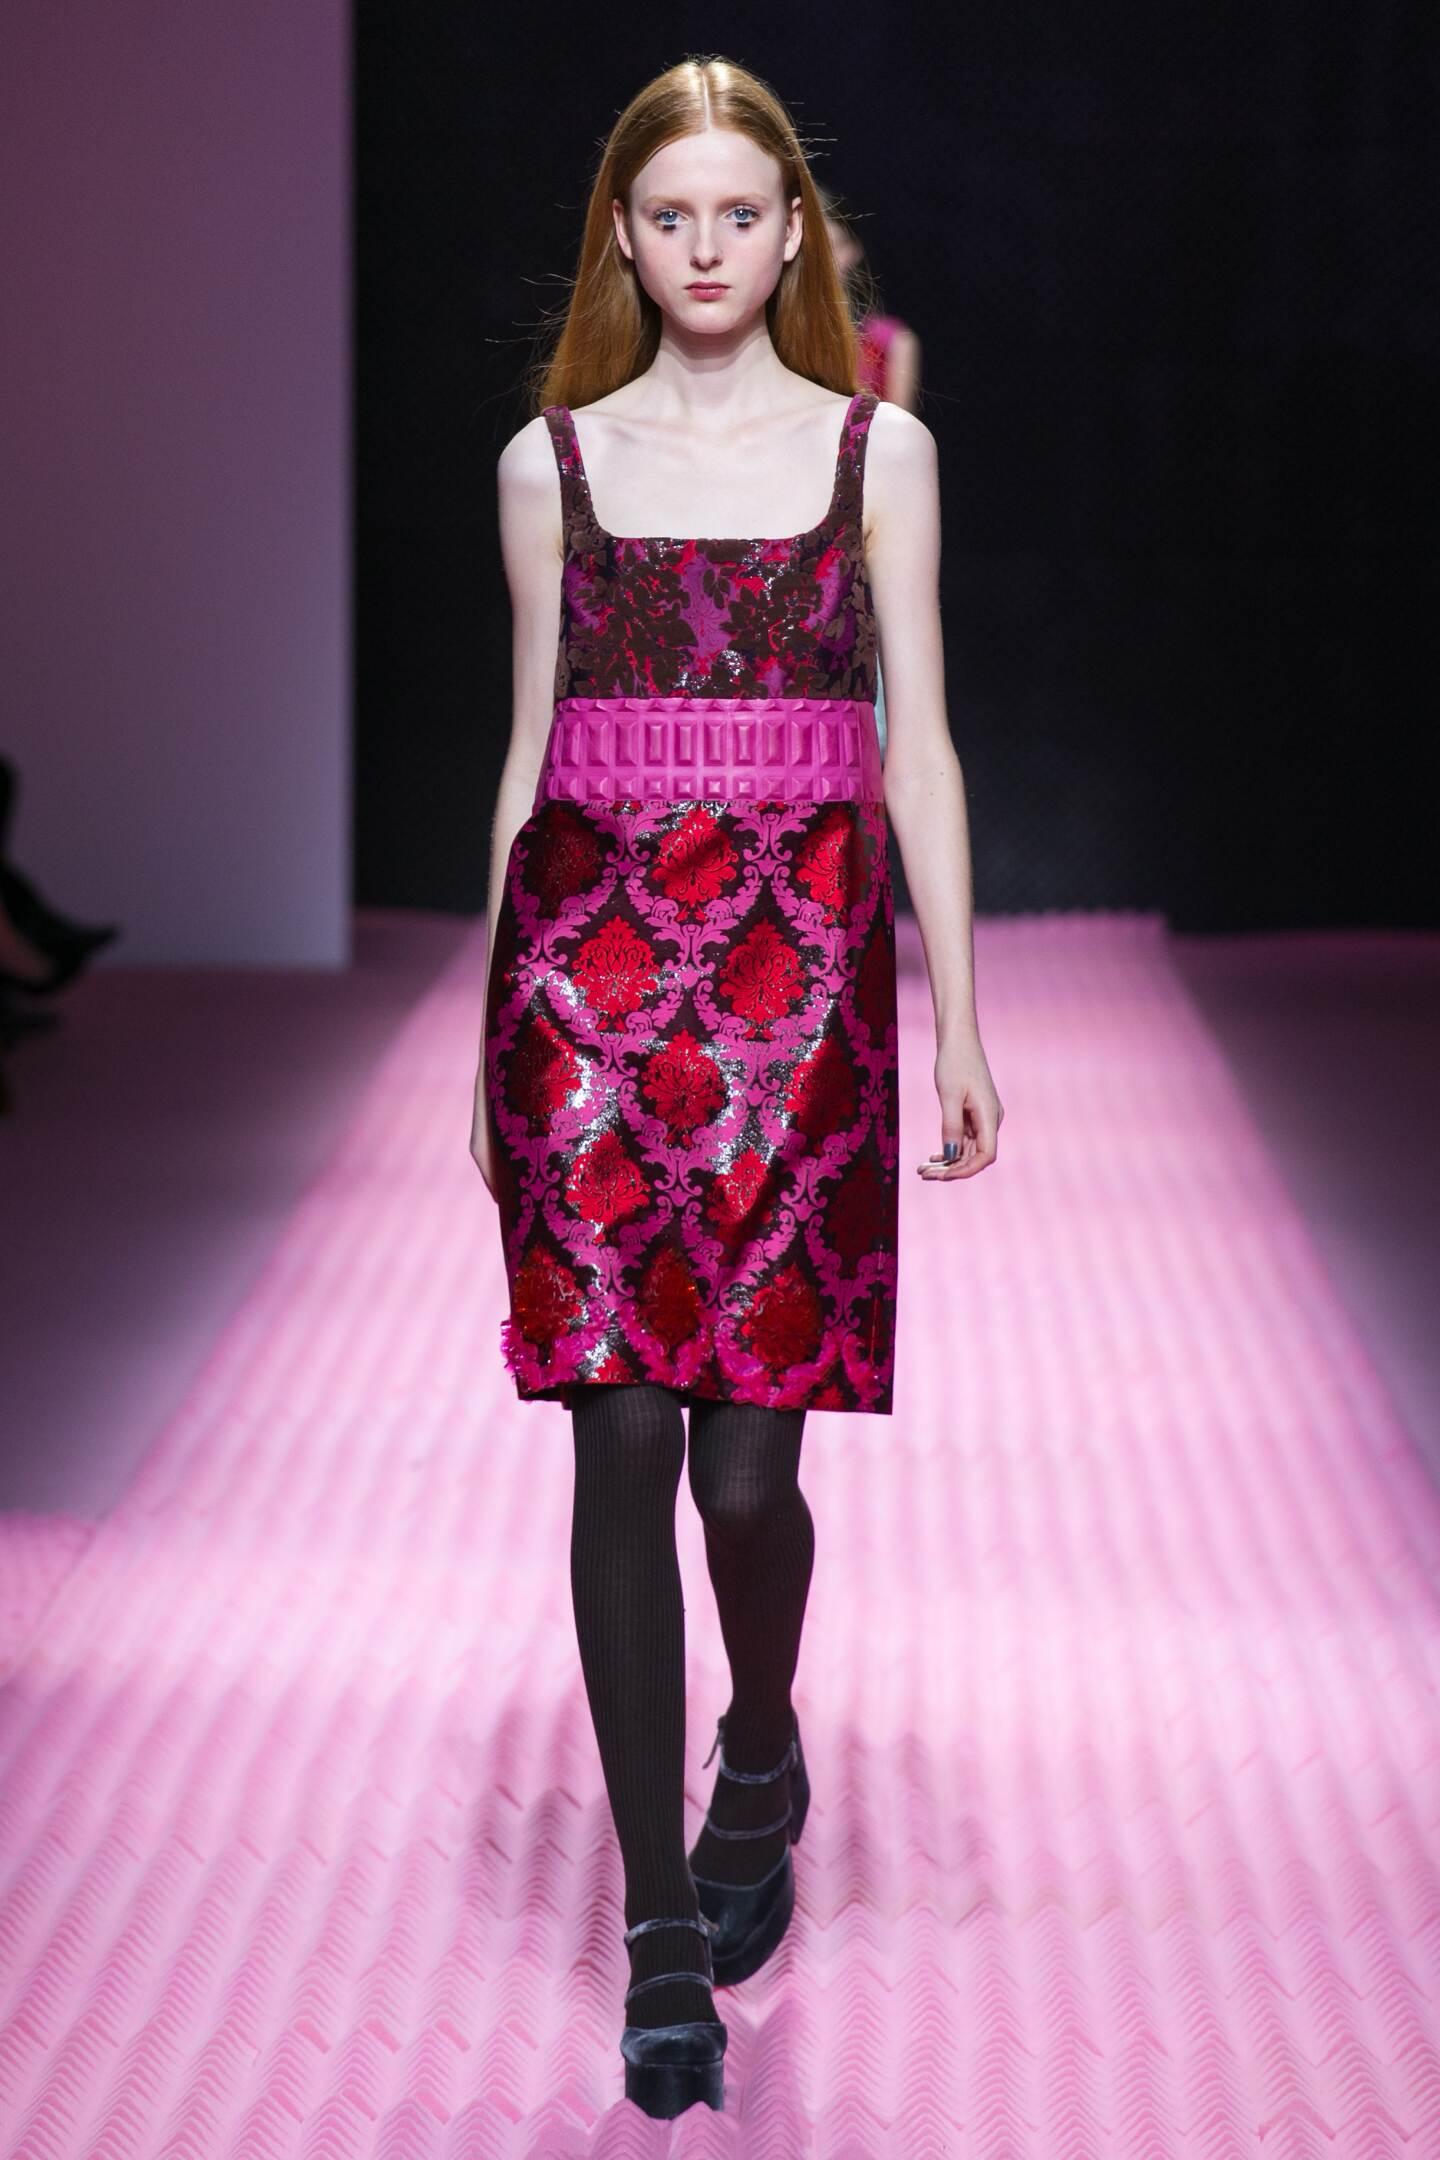 Fall 2015 Fashion Trends Mary Katrantzou Collection